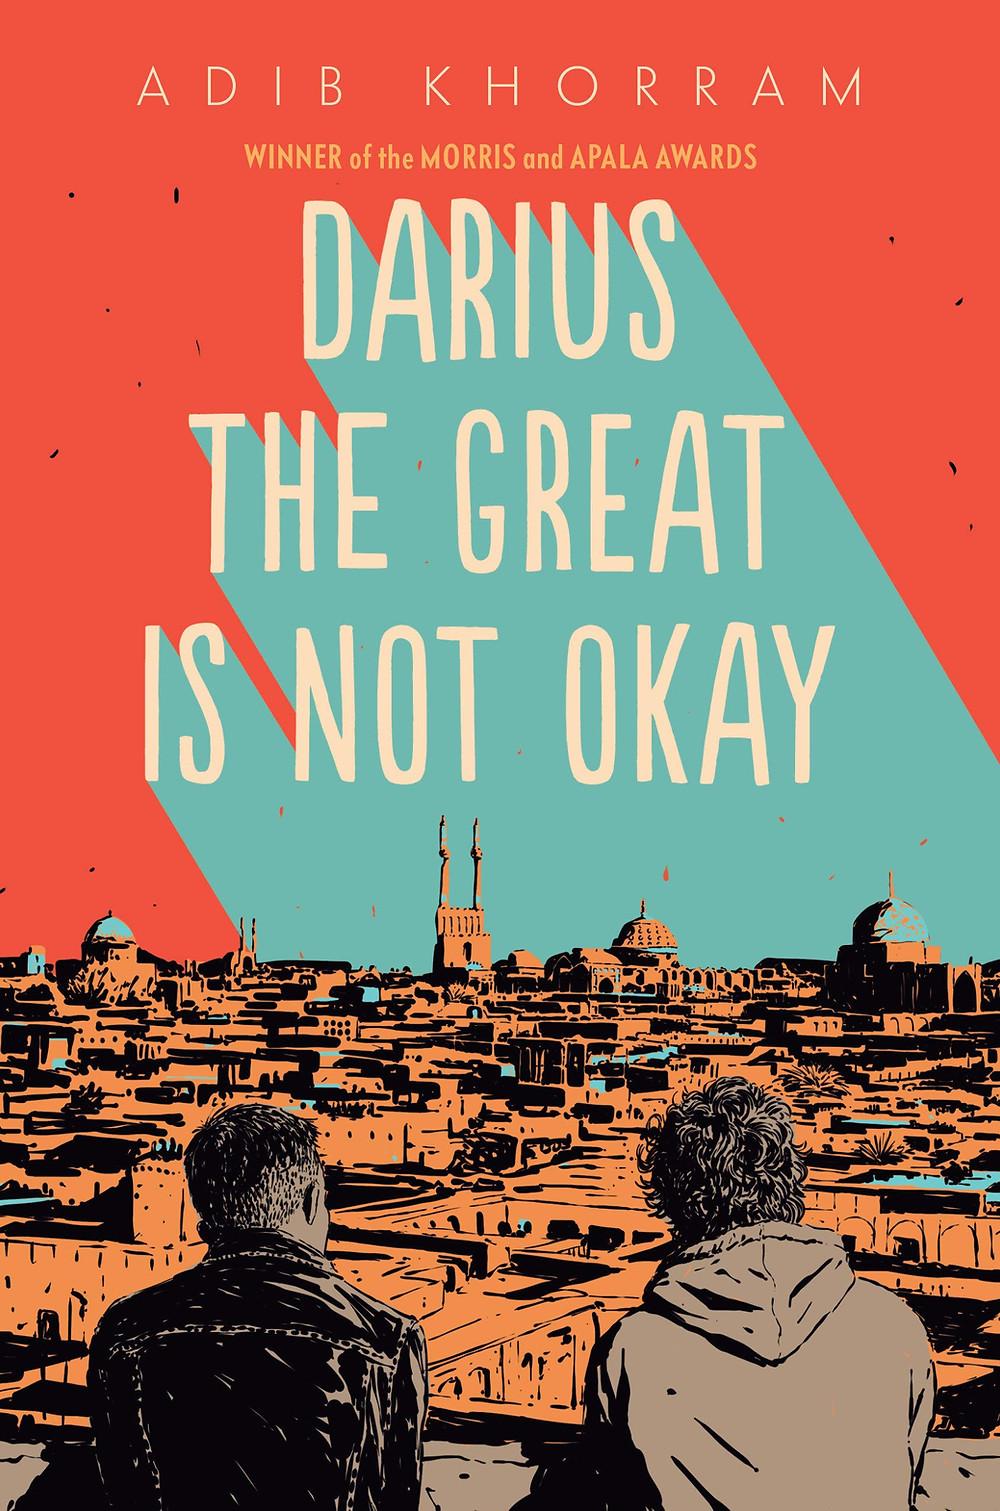 Book Cover of Darius the Great Is Not Okay by Adib Khorram